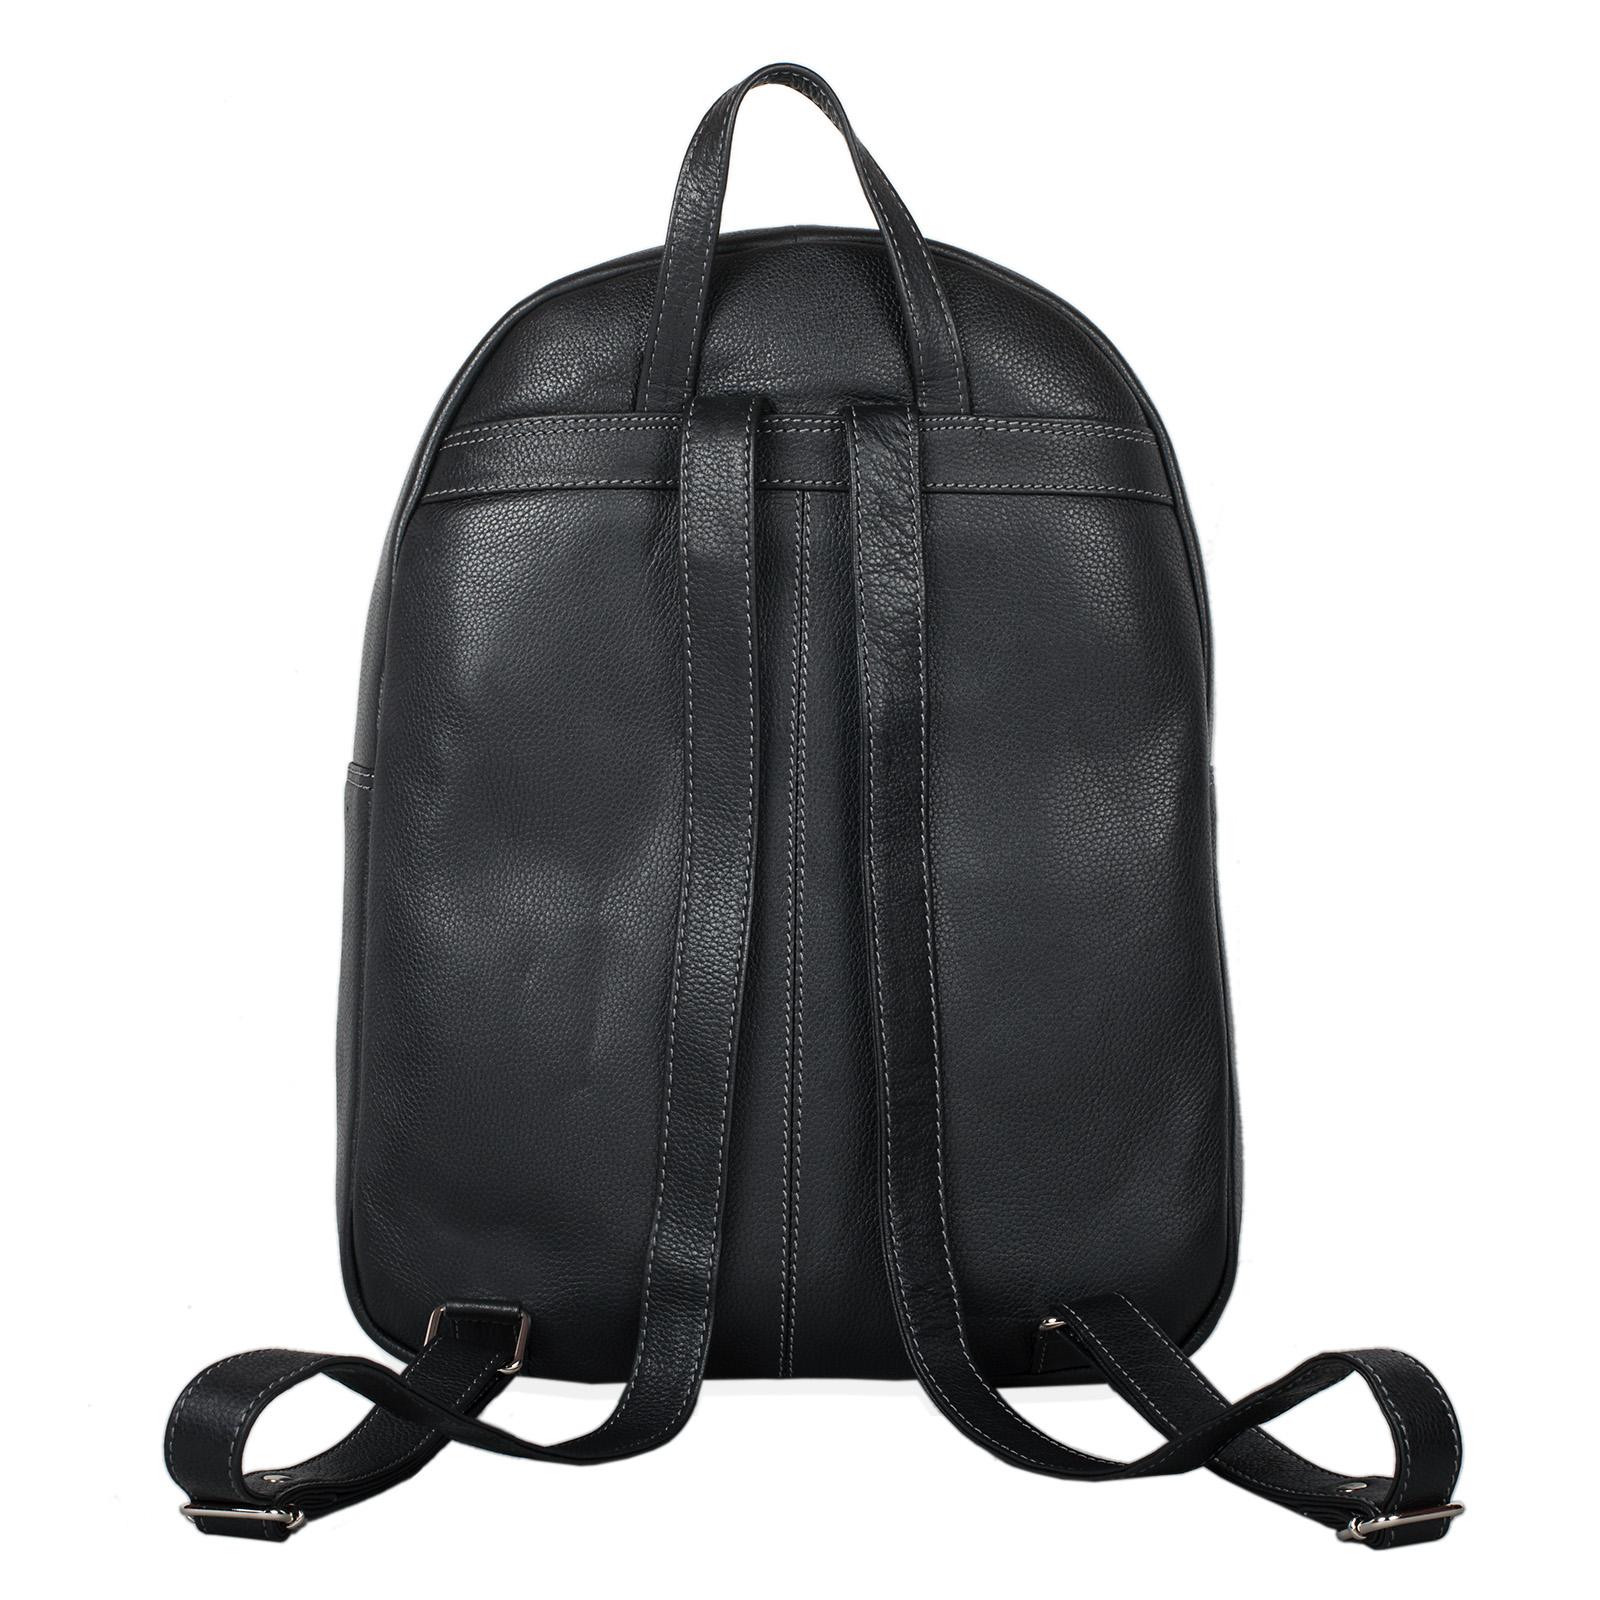 "STILORD ""Conner"" Leder-Rucksack Herren groß Vintage Daypack Backpack Unirucksack Schule Freizeit Rucksackhandtasche Business 13,3 Zoll Laptop A4 echtes Rindsleder - Bild 20"